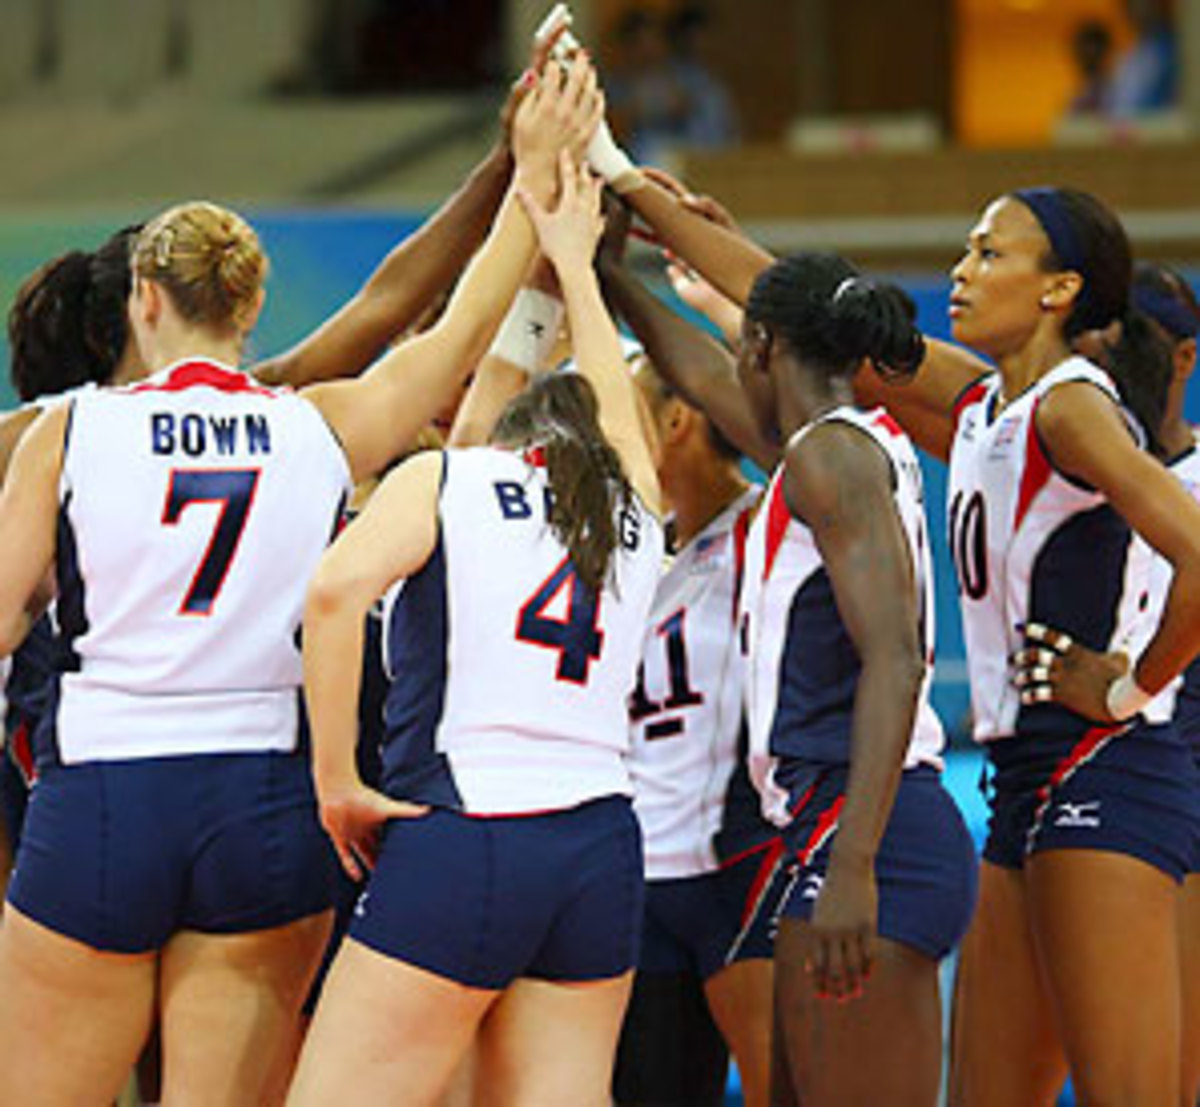 usa_womens_volleyball.jpg